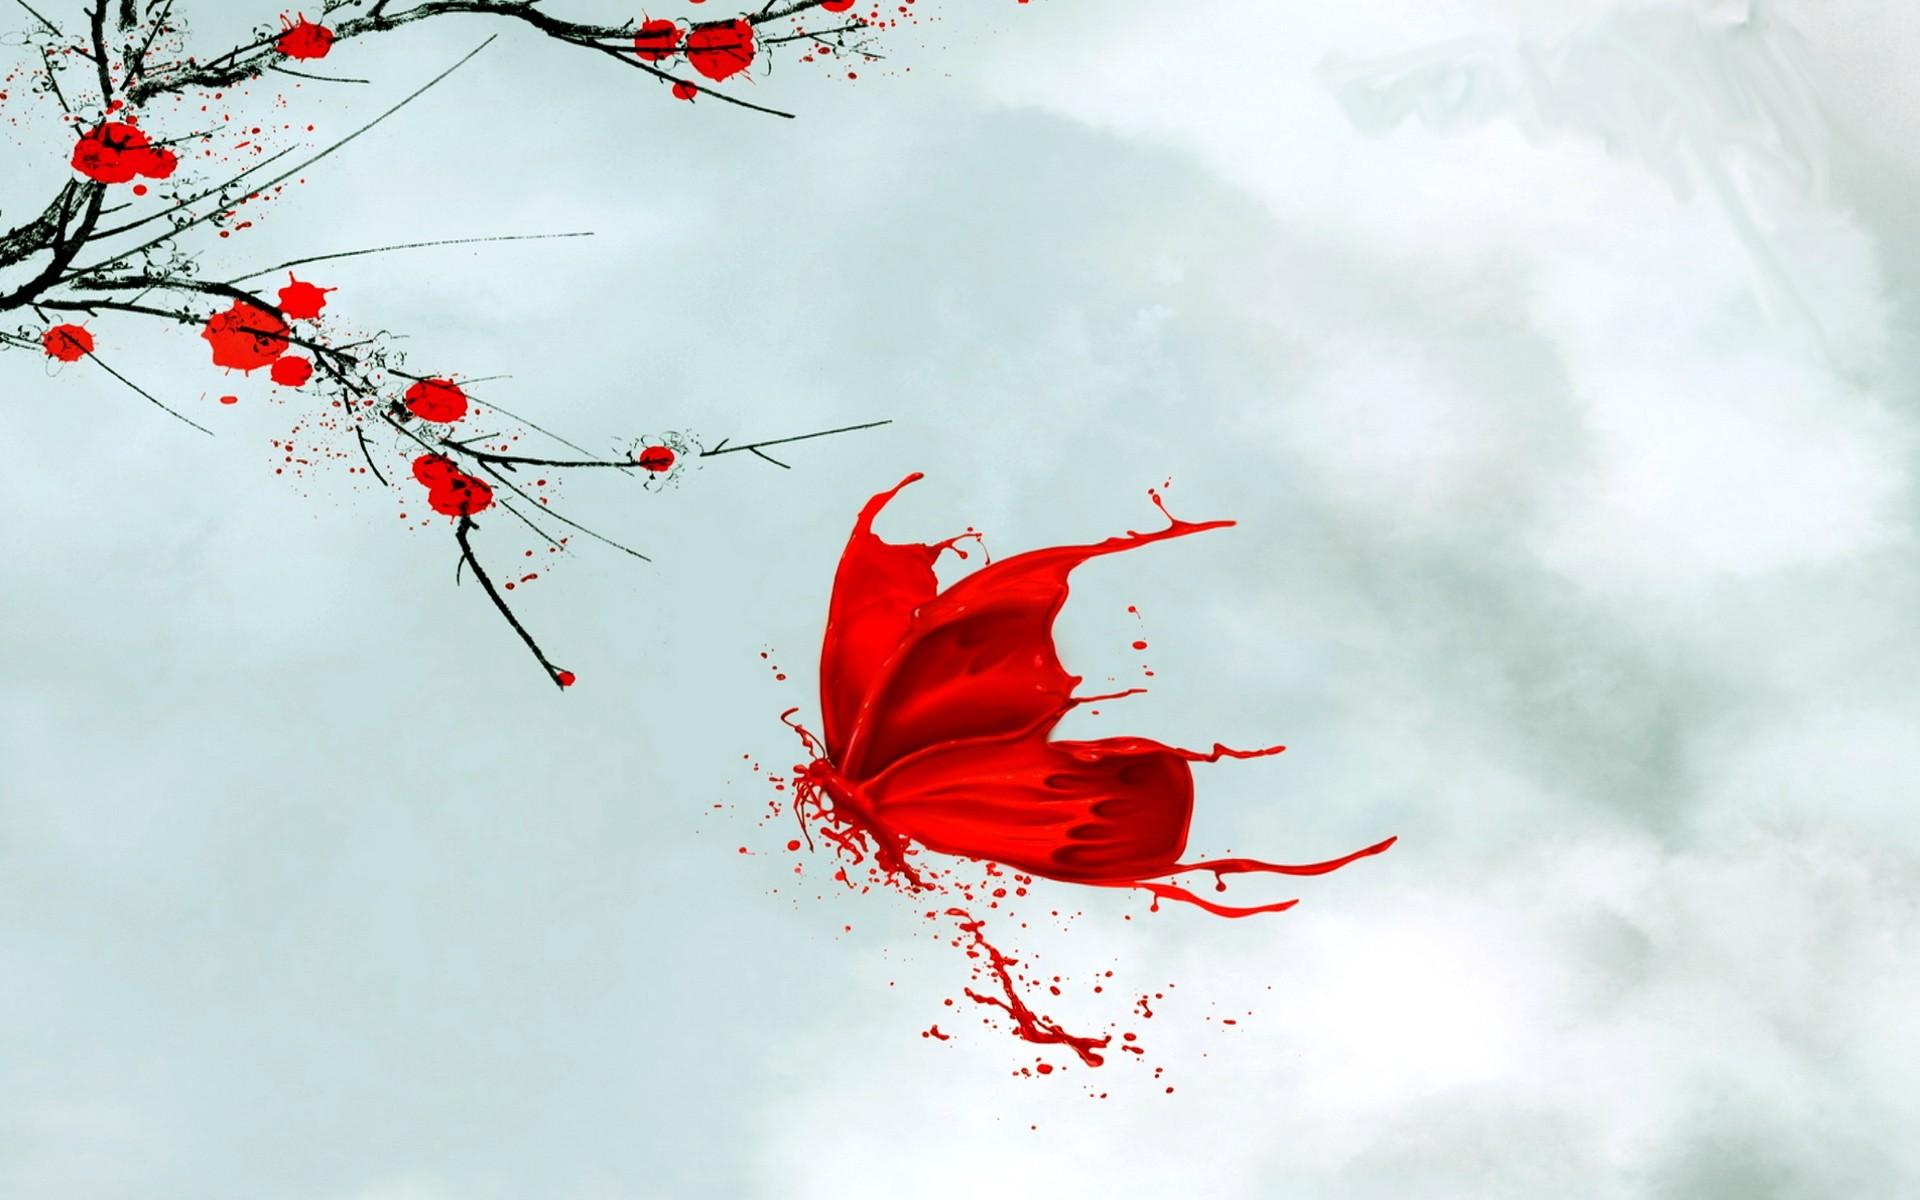 картинки бело-красно-черного цвета родом села